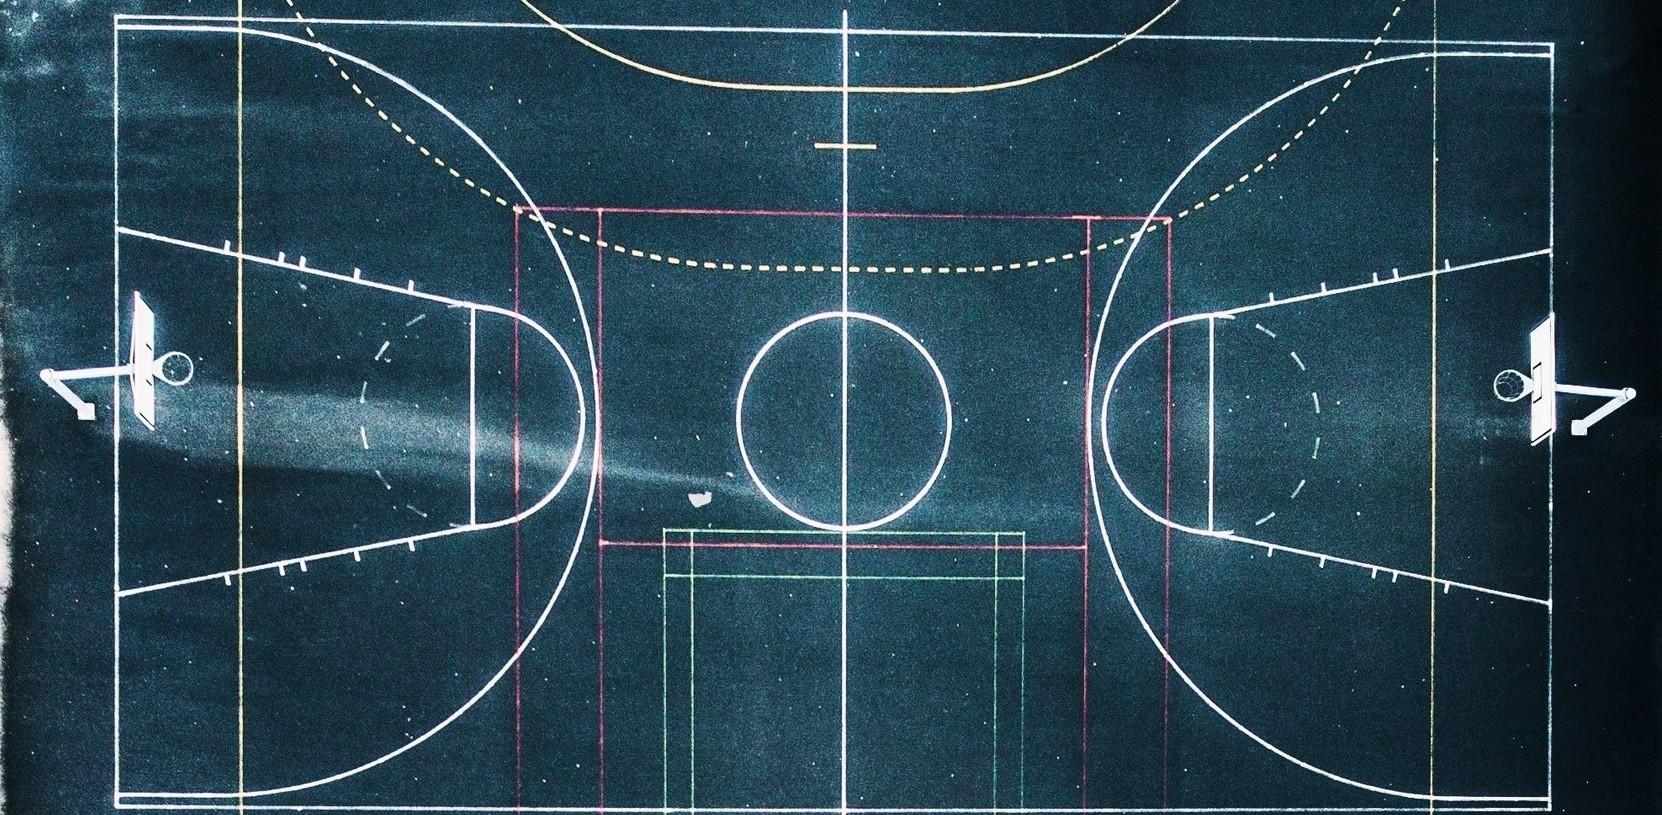 Основные правила баскетбола кратко